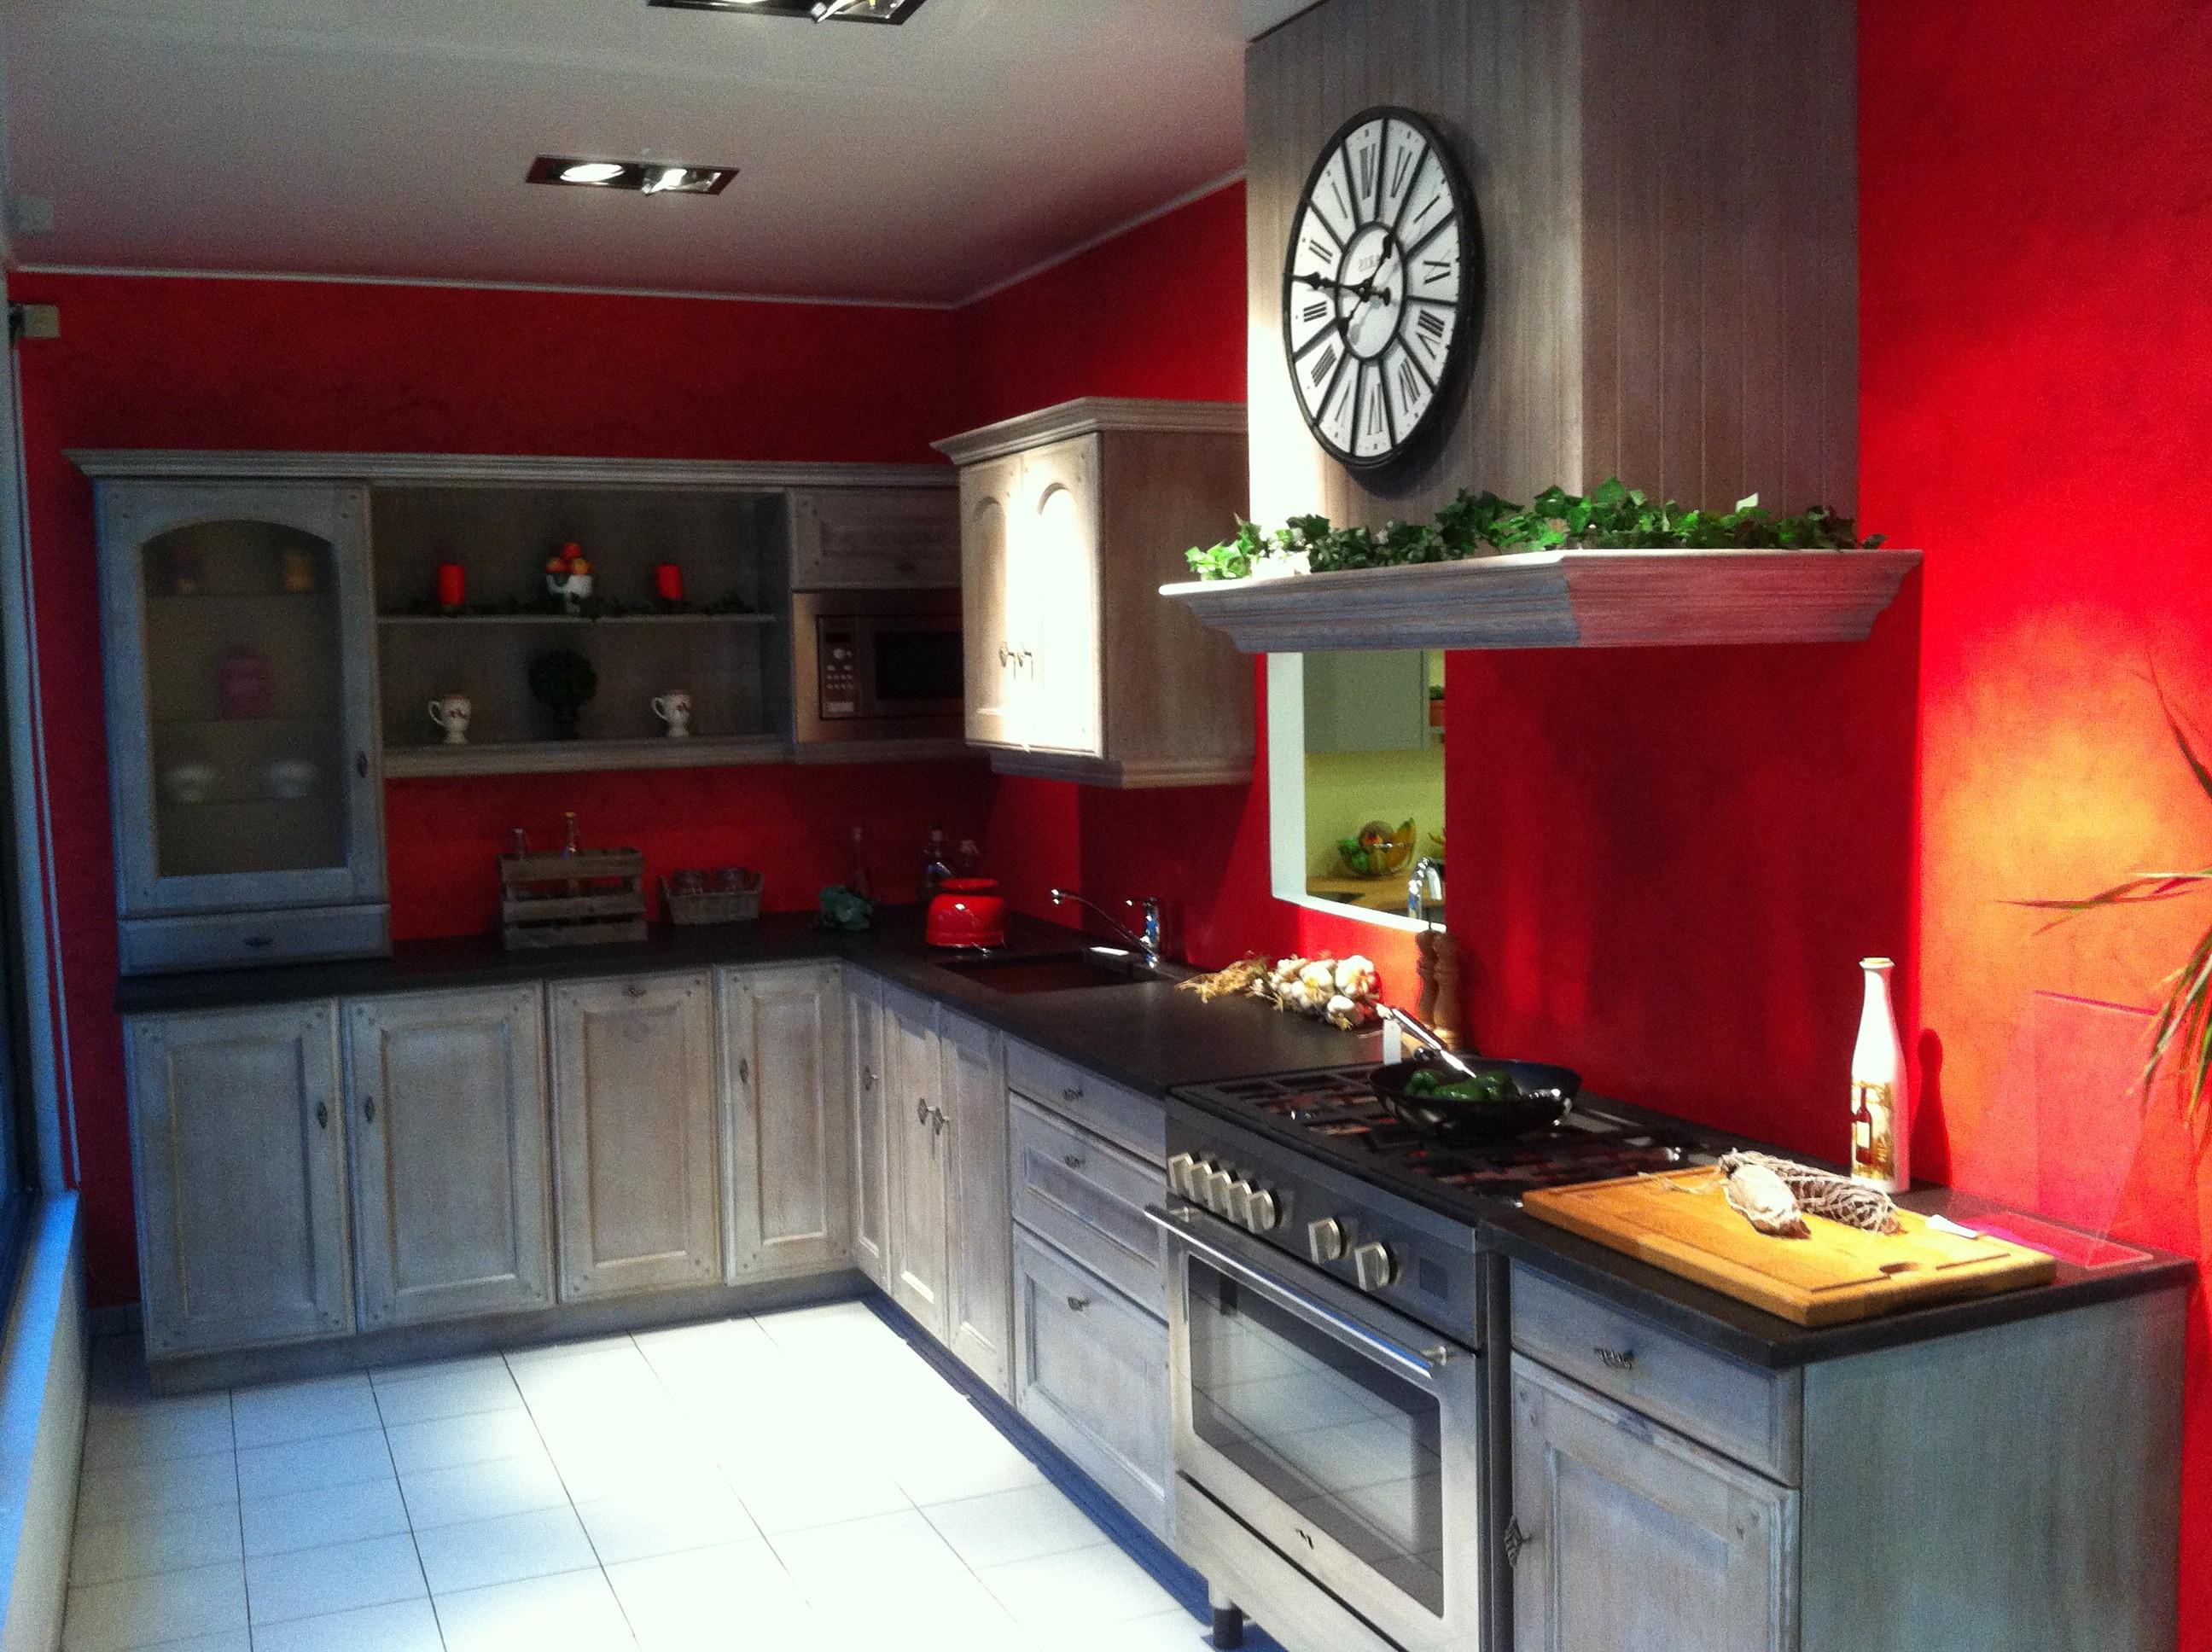 Peinture murale pour cuisine rouge cuisine id es de for Cuisine peinture rouge